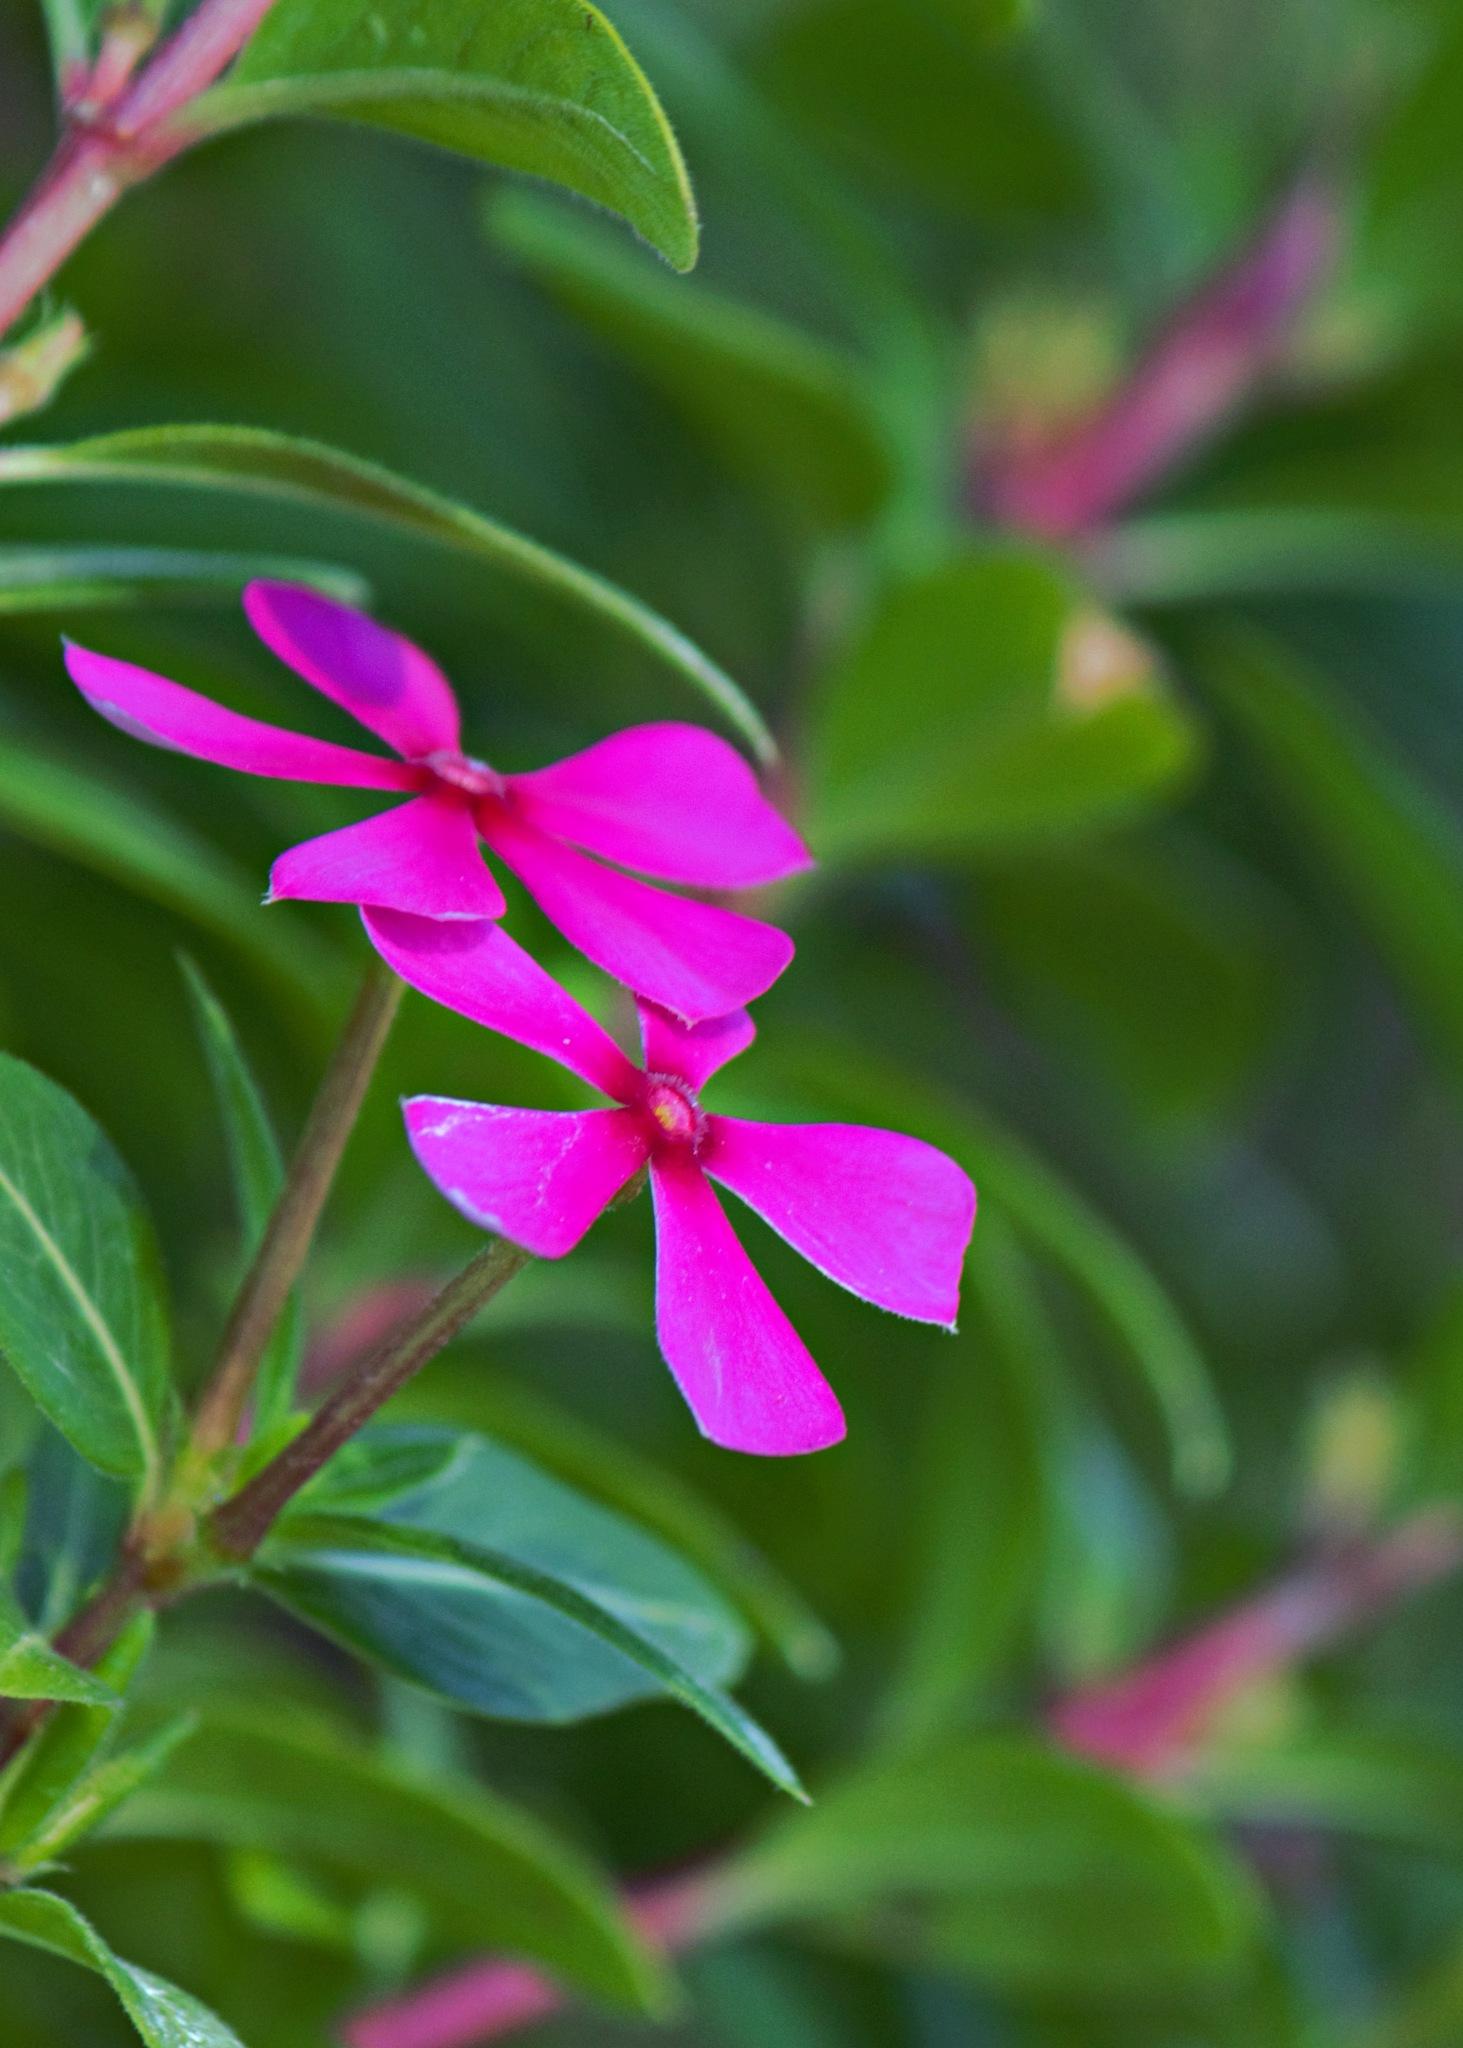 In Bloom by Zohel Mercado